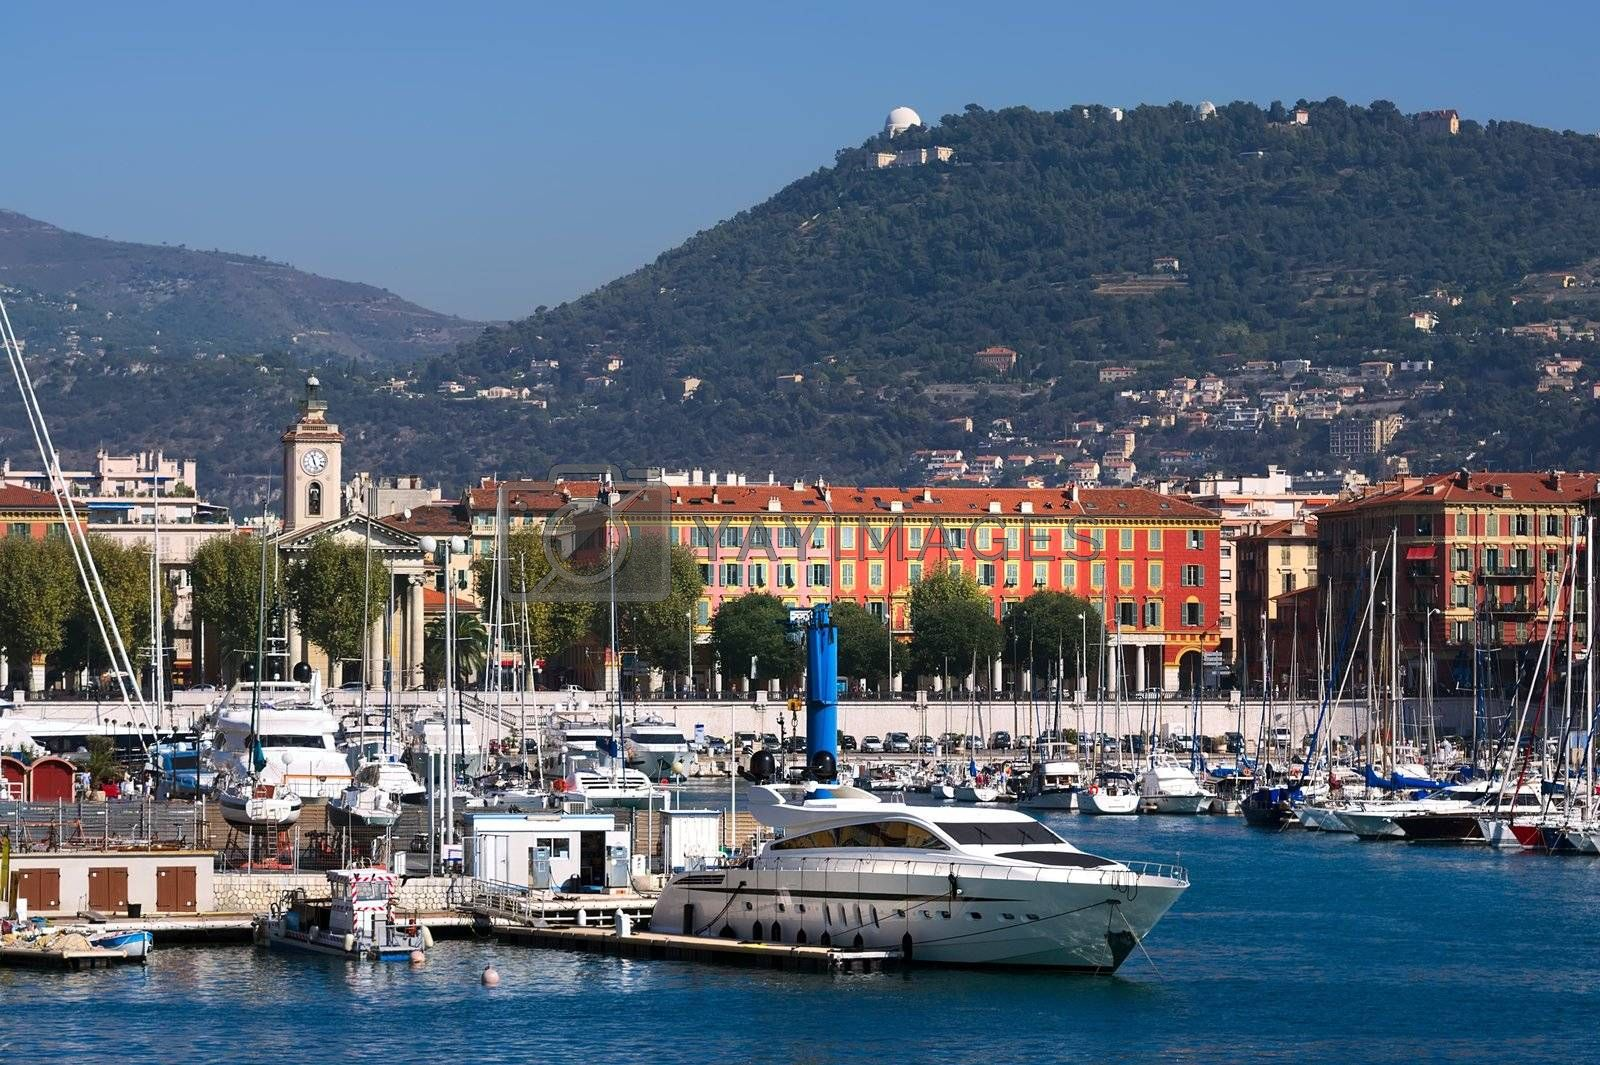 view over Marseille port, Mediterranean Sea, France